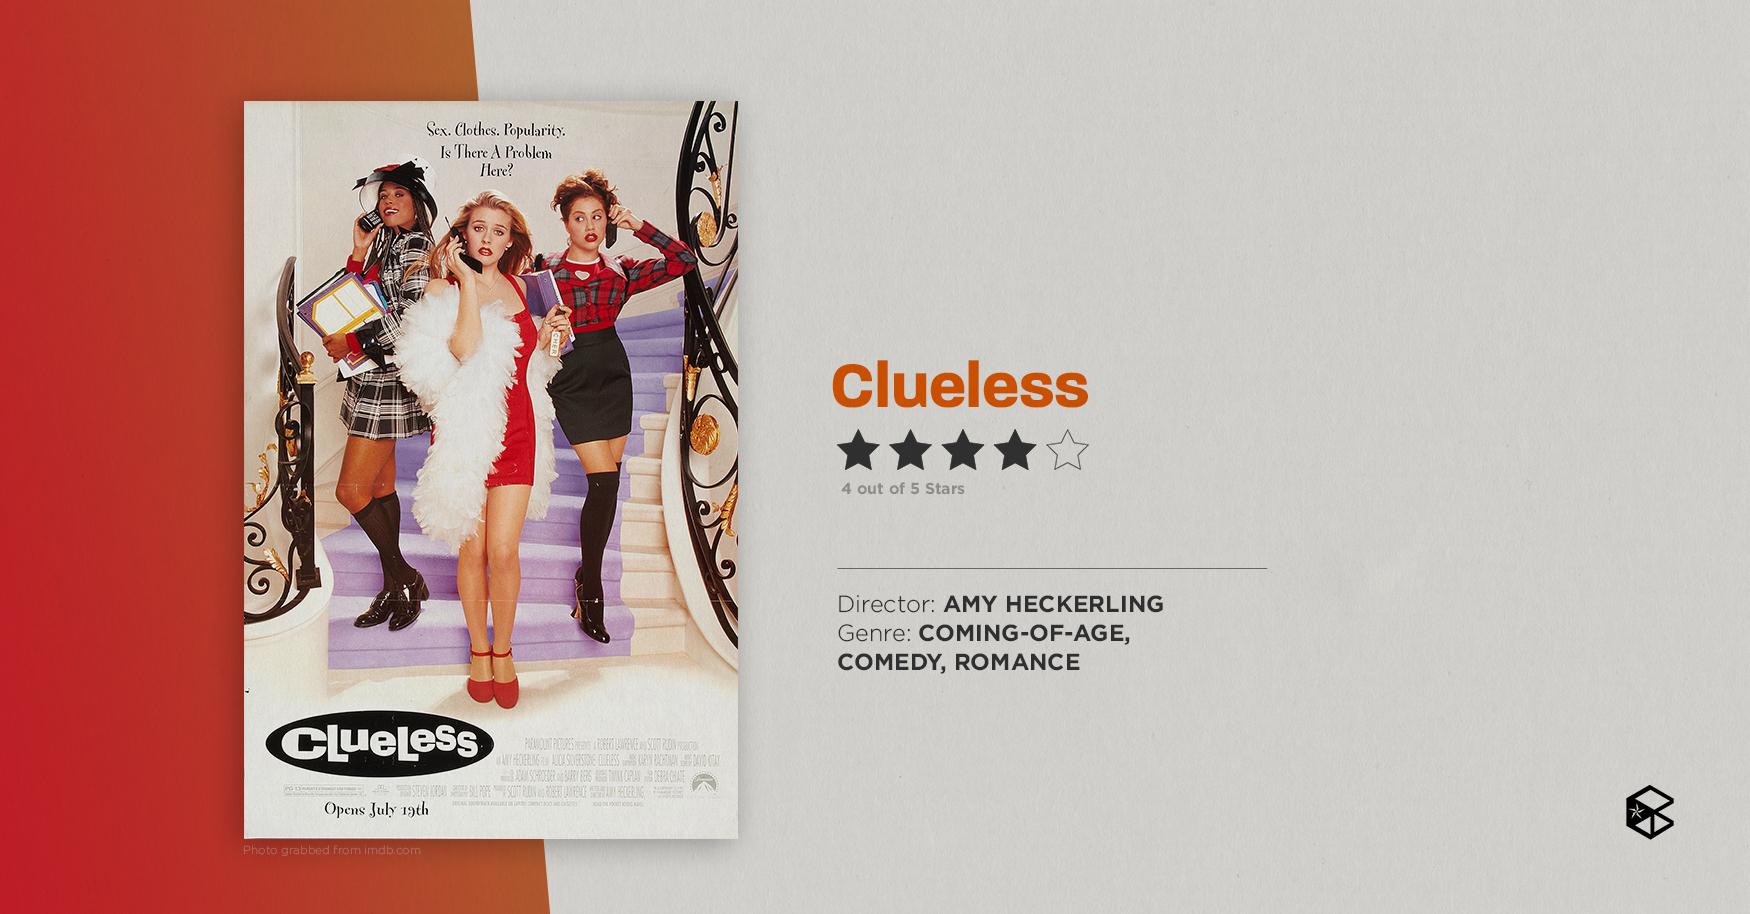 030121 Clueless